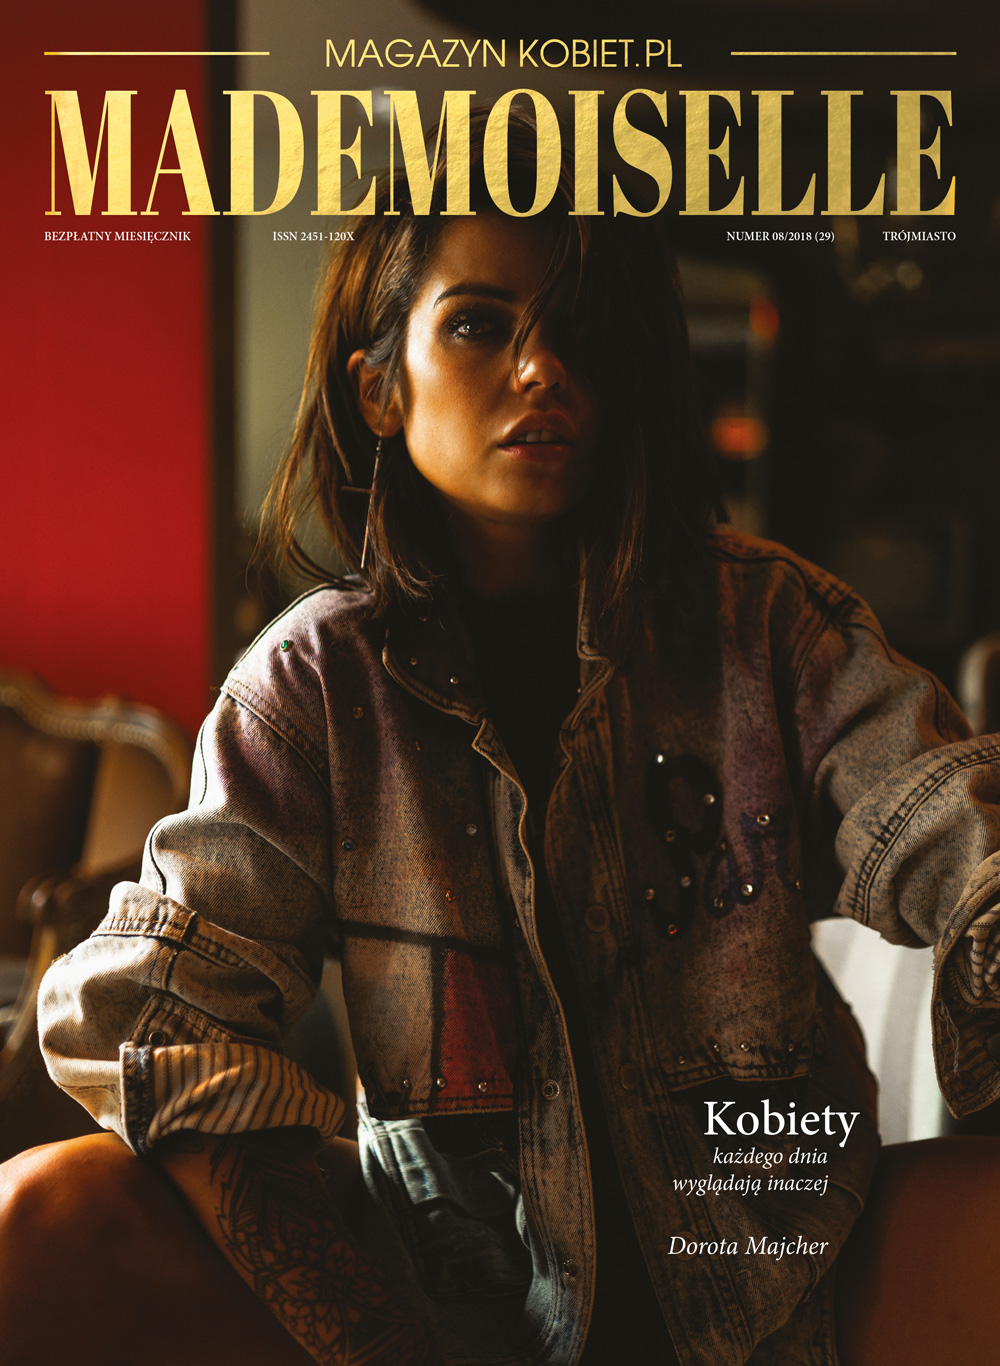 magazynkobiet.pl - okladka MKmademoiselle lipiec FRONT 1 - Archiwum czasopism